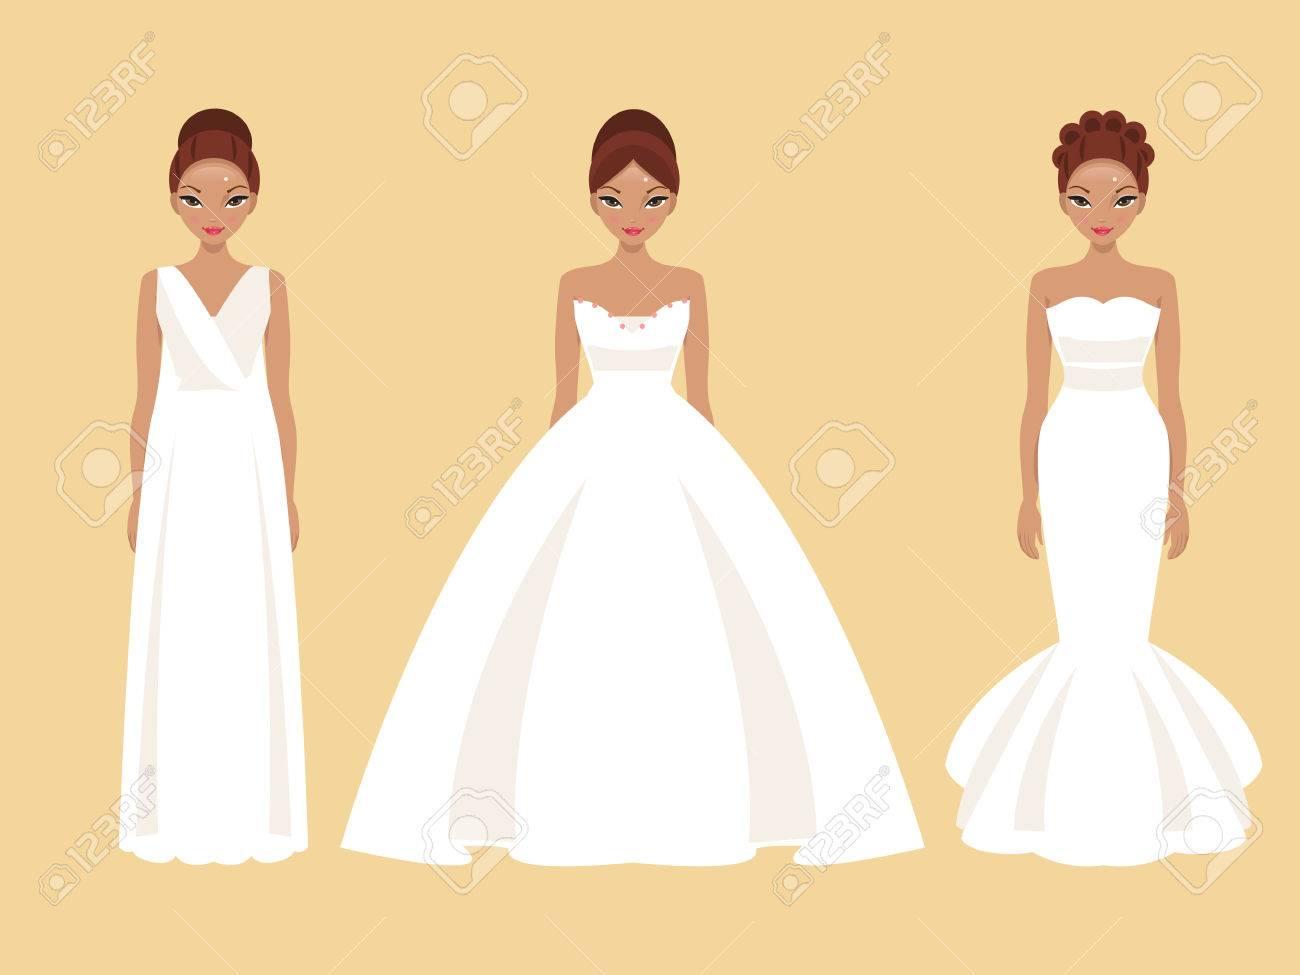 Diferentes estilos de vestidos de novia